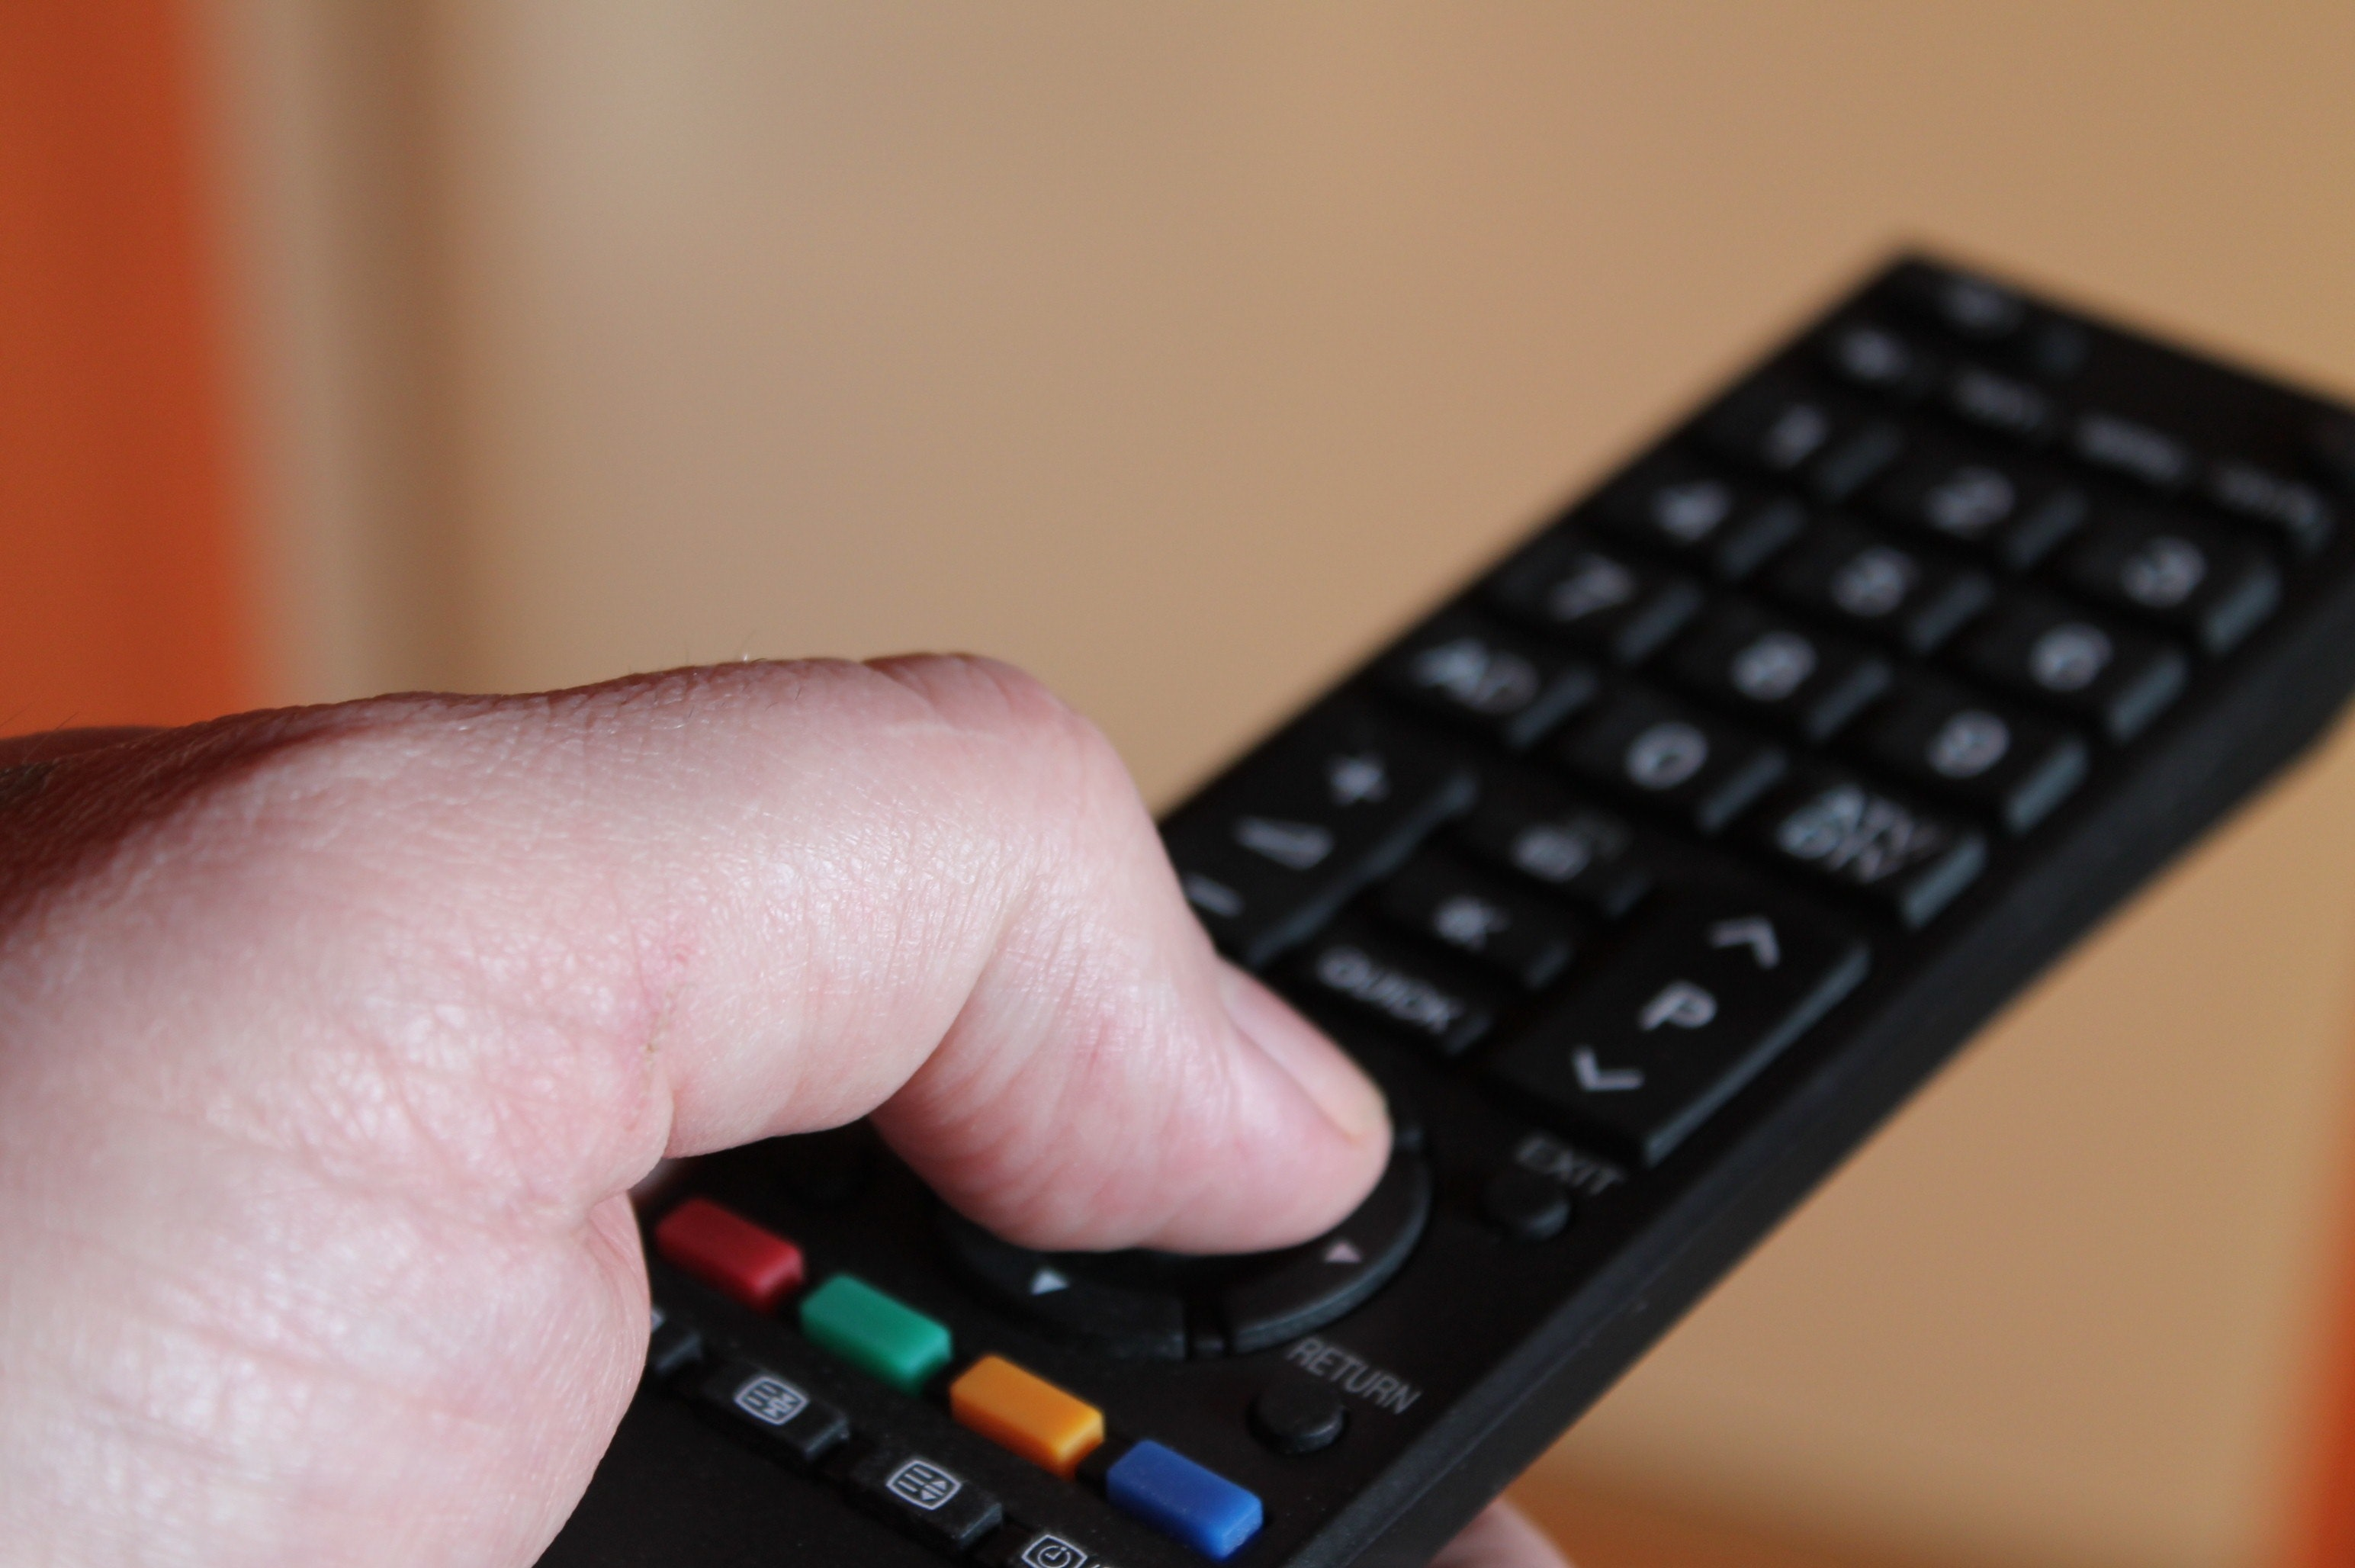 CBS USVI, Viya Unable to Reach Agreement